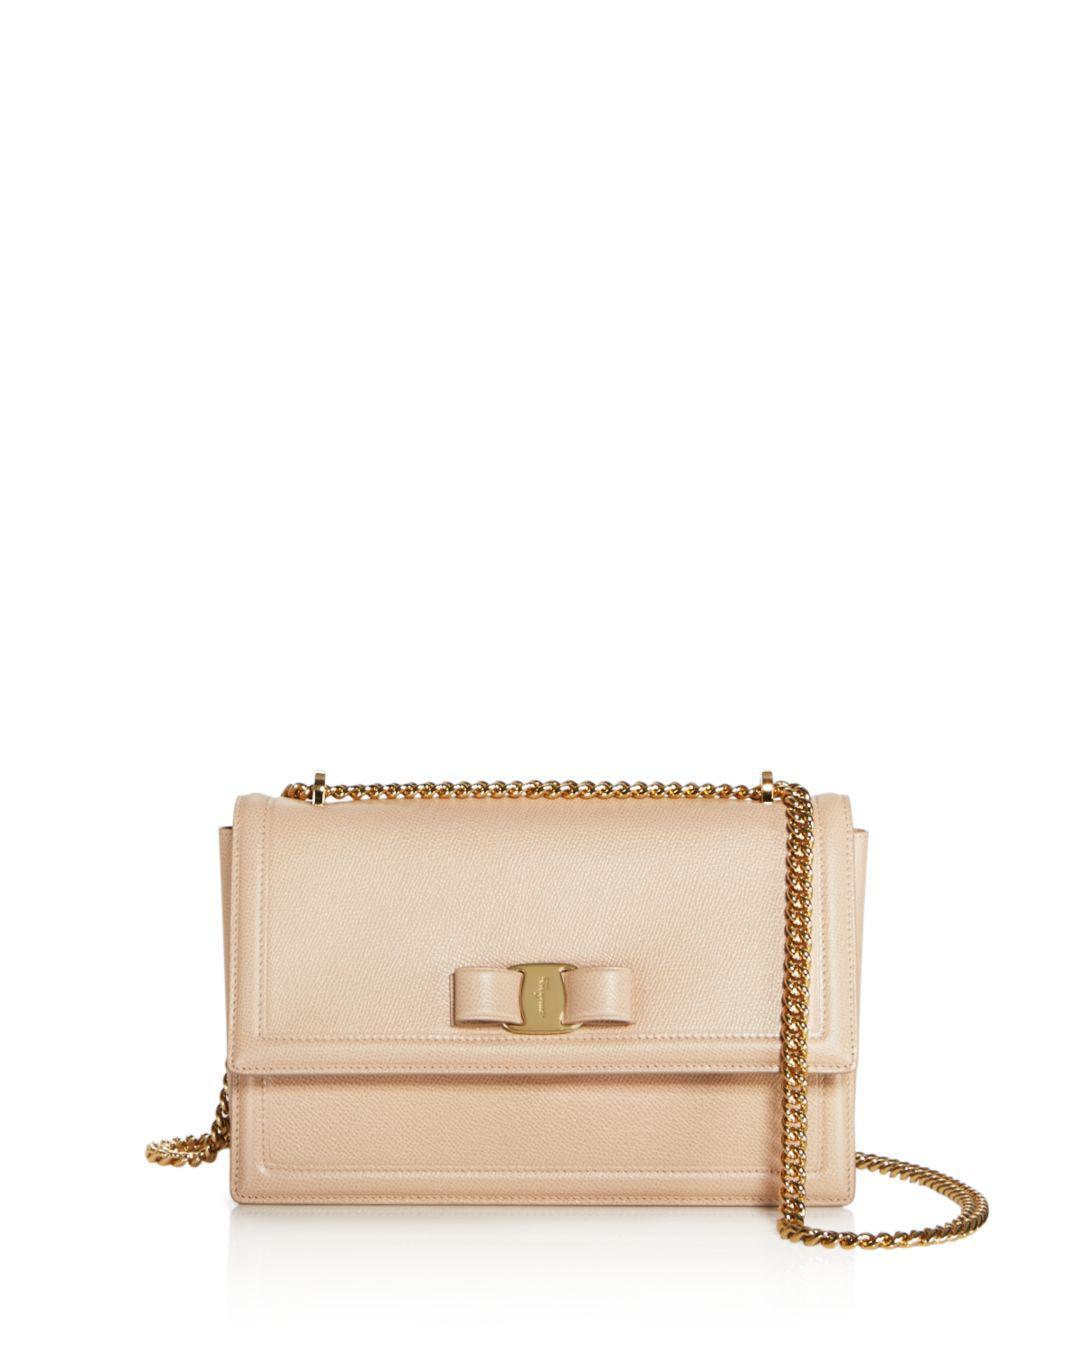 Ferragamo. Women s Ginny Medium Saffiano Leather Shoulder Bag f93e20c848614